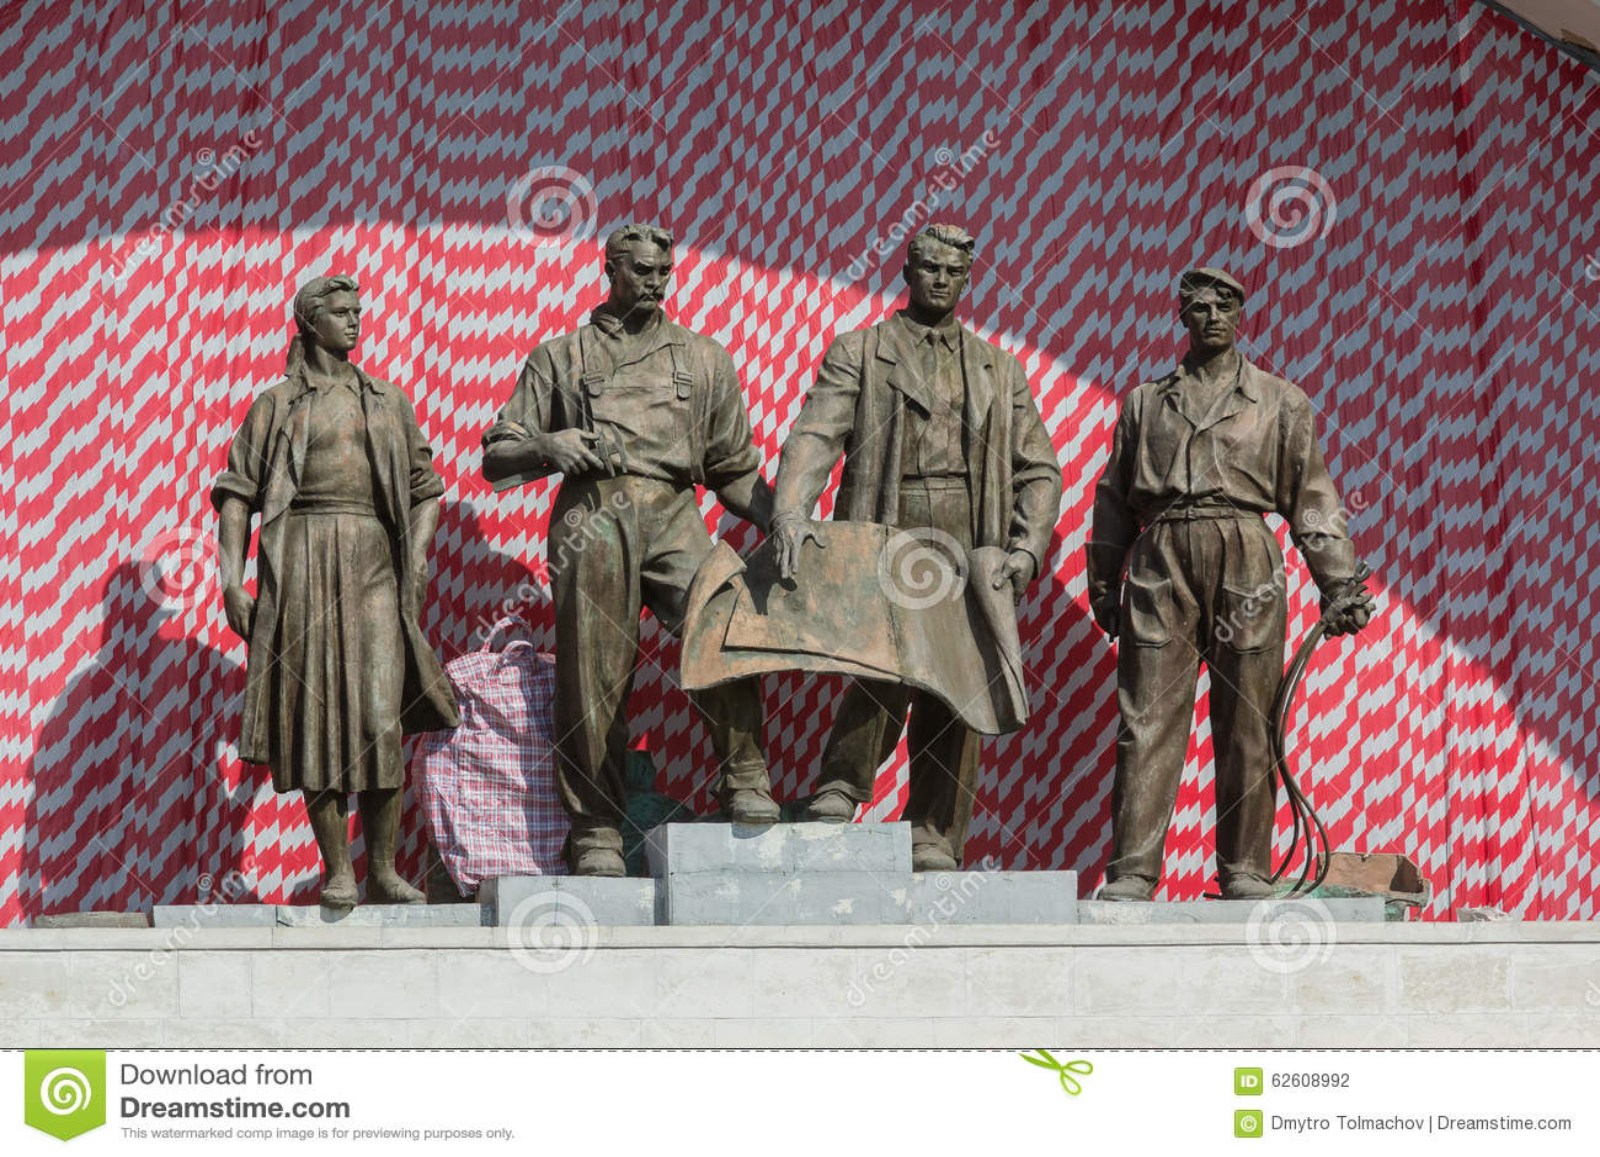 Grupo escultural de épocas soviéticas Kiev, Ucrânia